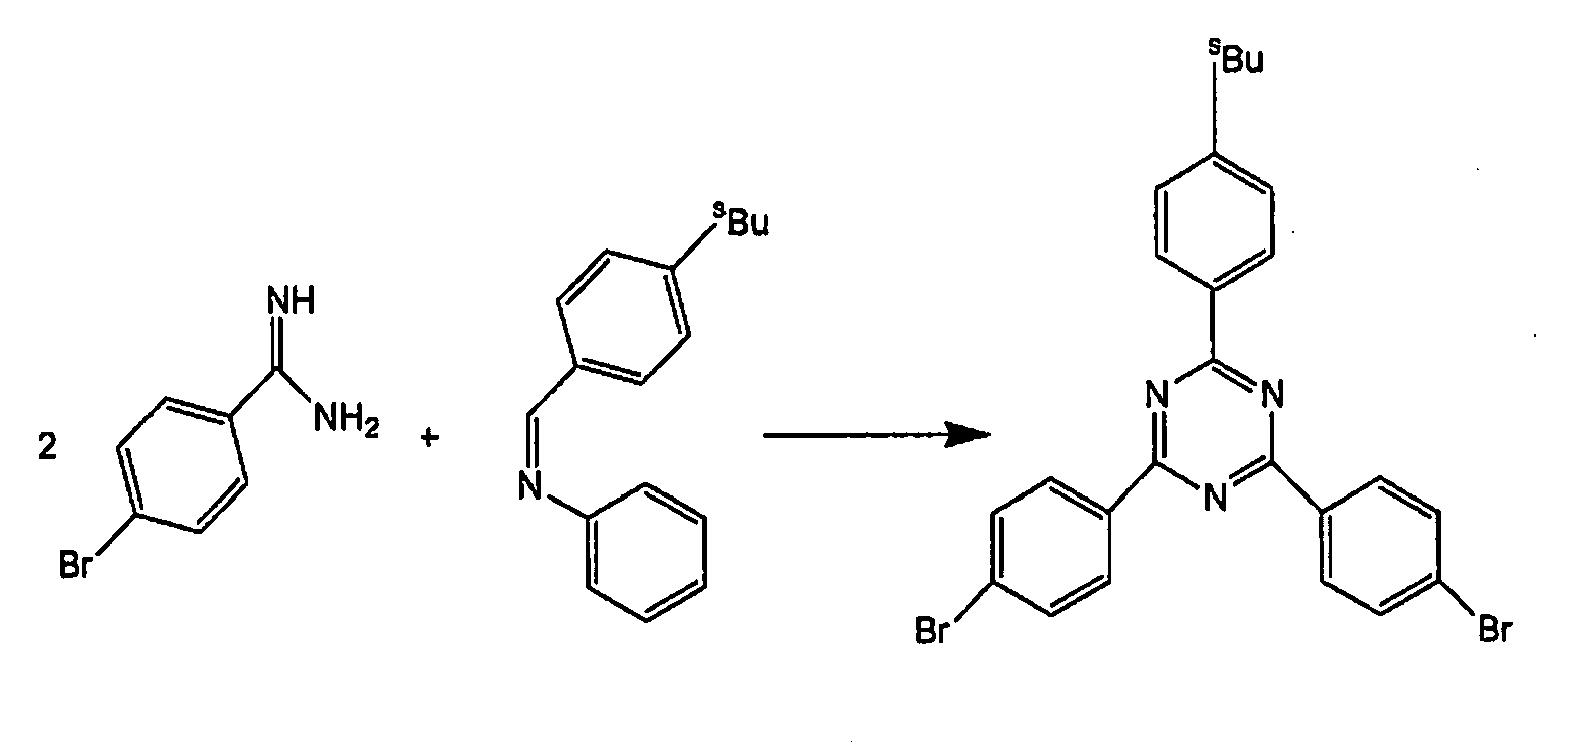 Ep2166582a1 Conjugated Copolymer Comprising Triazine